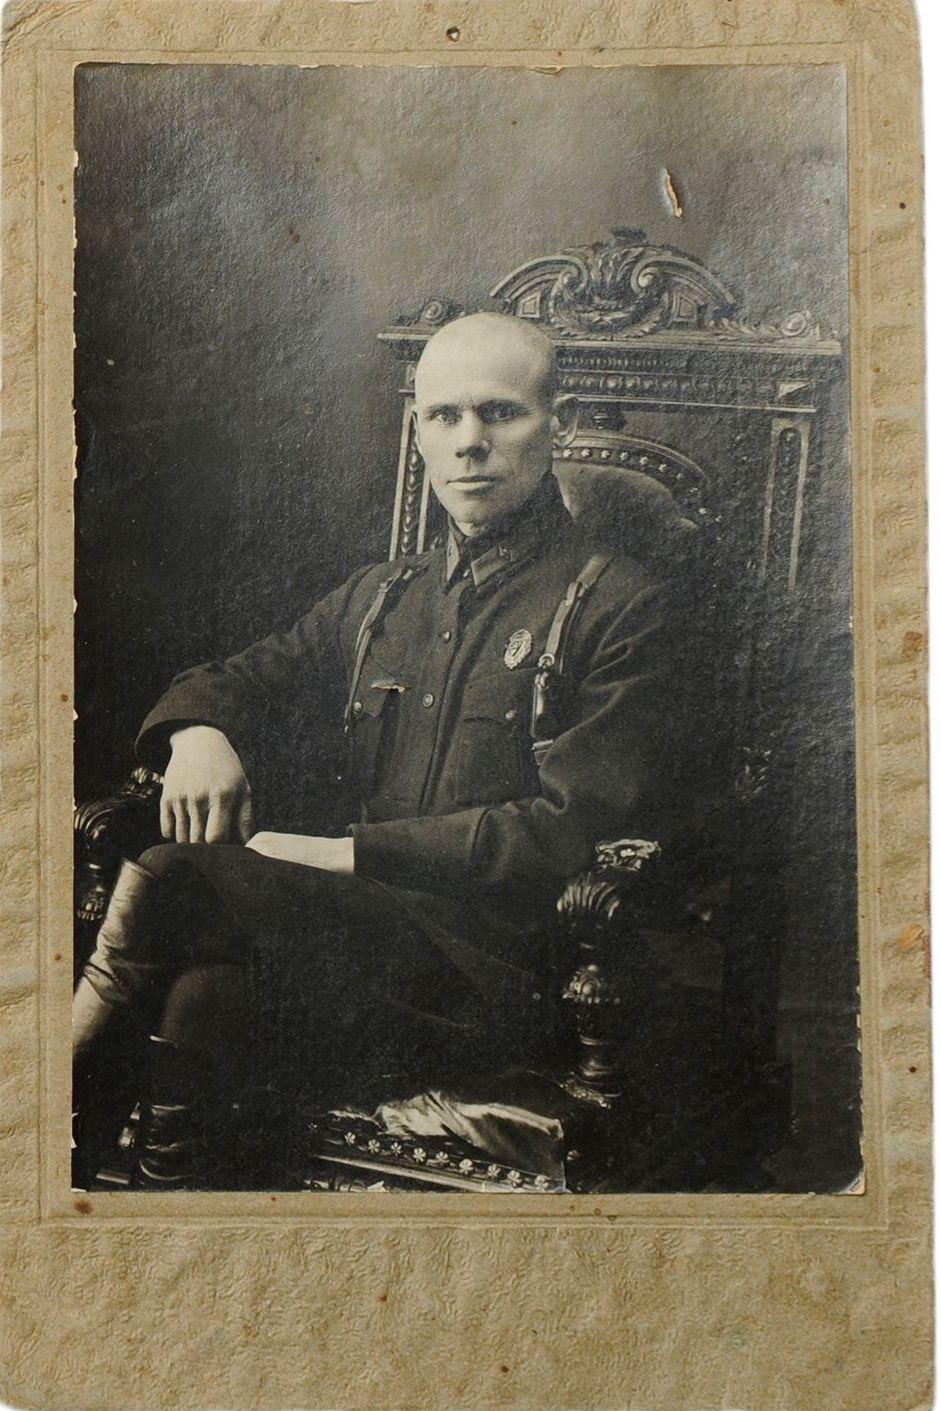 1930-е. Фото начальника горотдела милиции адмотдела исполкома